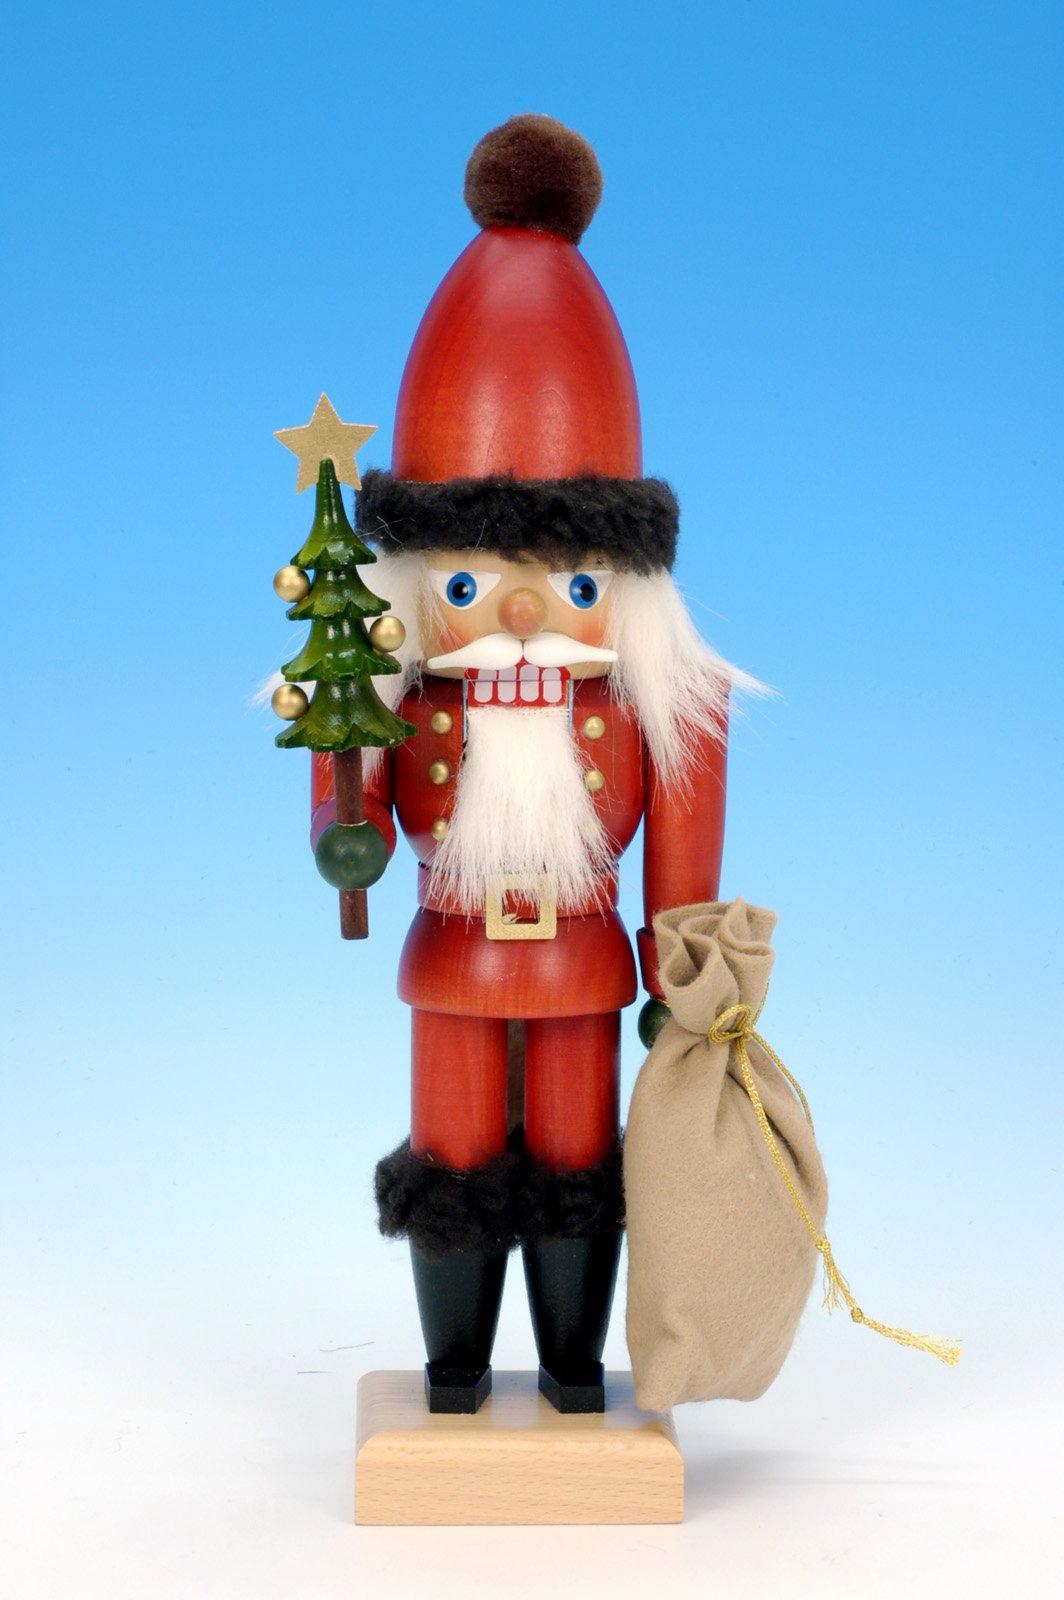 German Christmas Nutcracker Santa Claus - 30,0 cm / 12 inches - Authentic German Erzgebirge Nutcrackers - Christian Ulbricht by Ulbricht